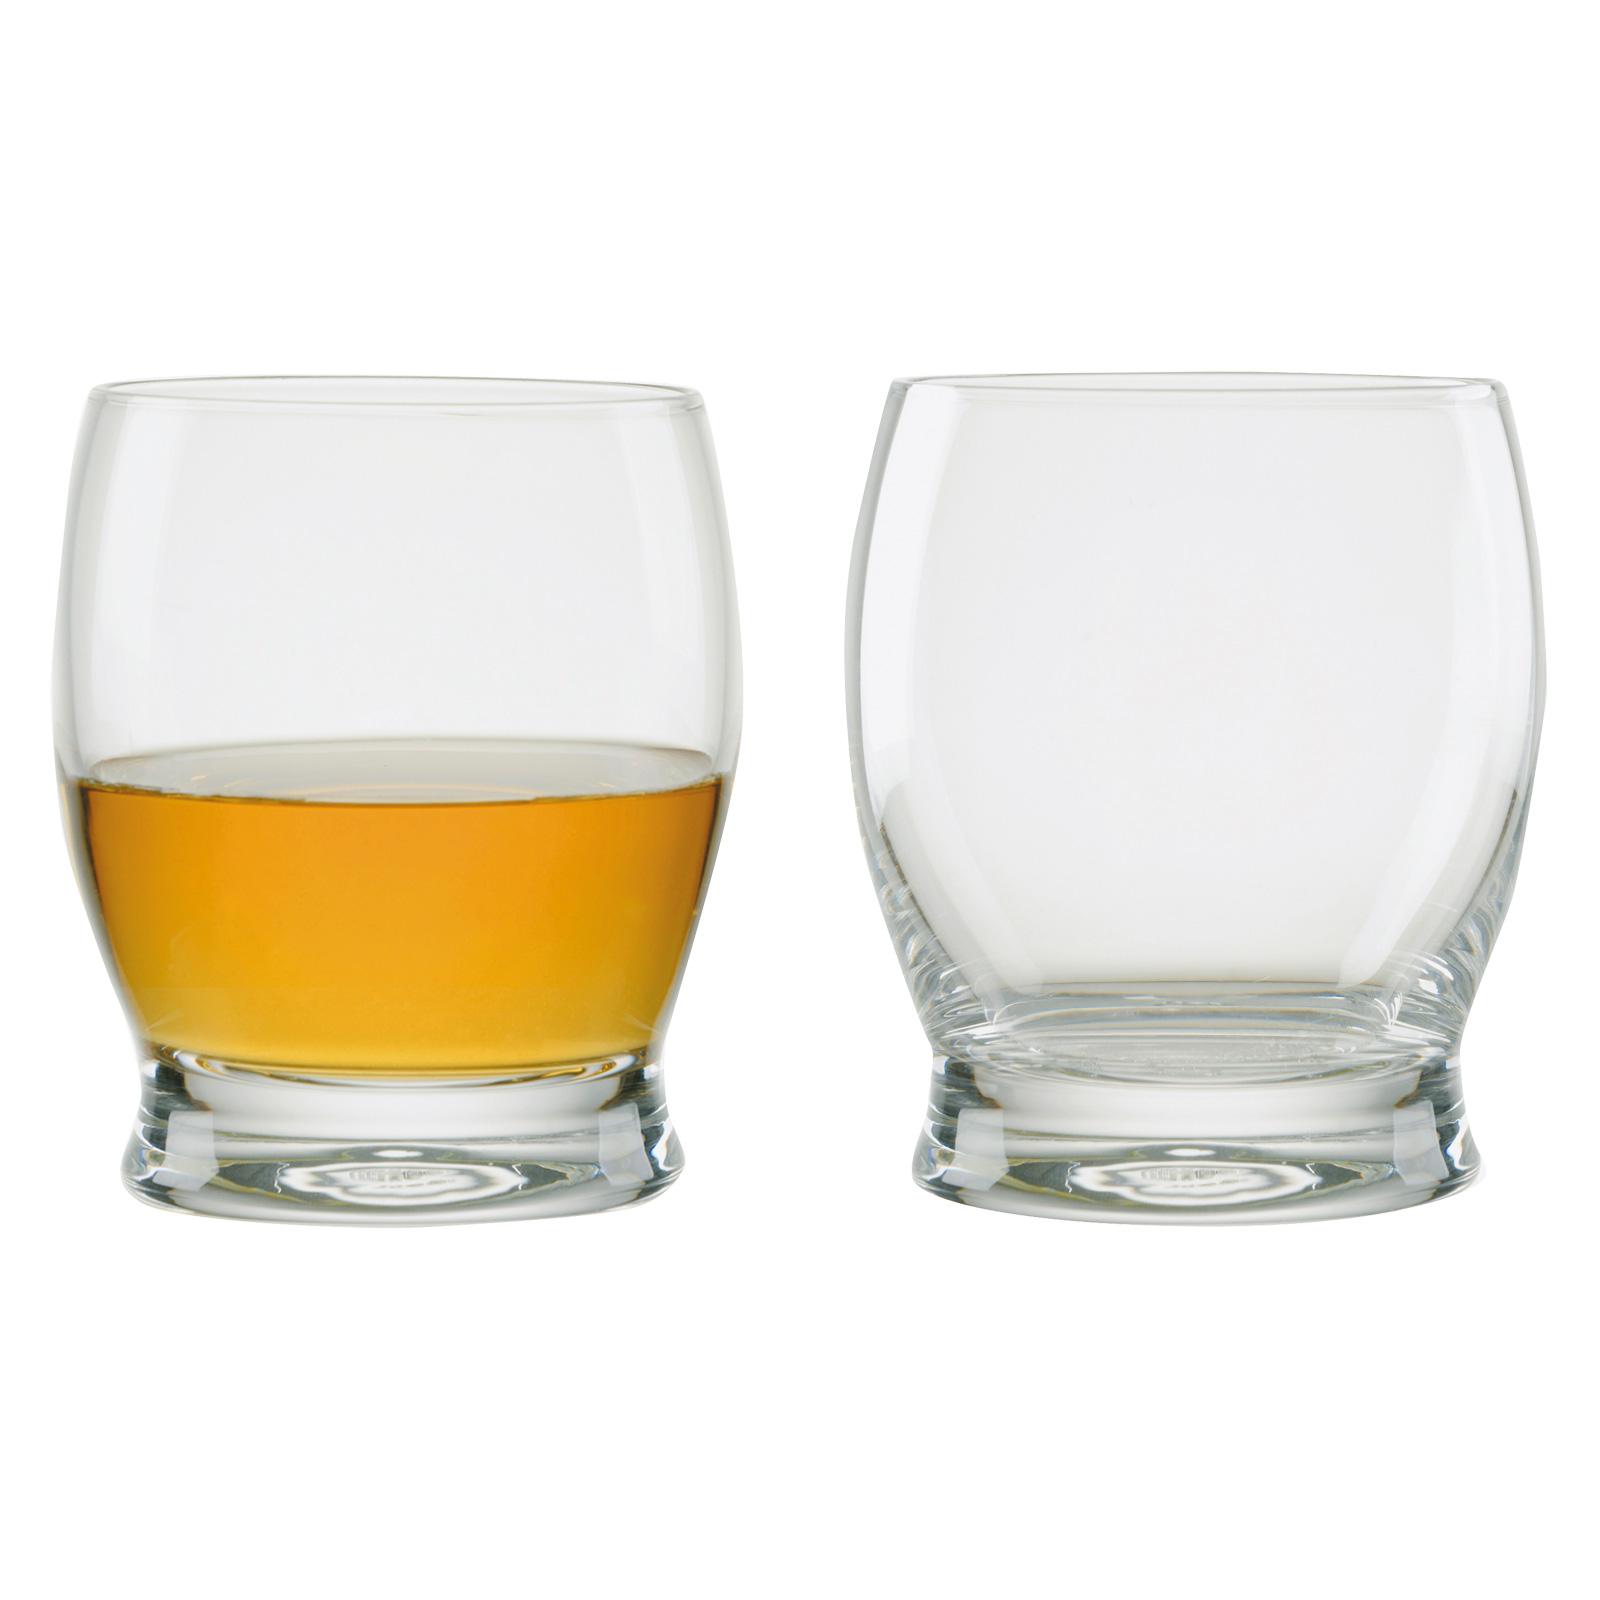 Set of 2 Manhattan Whisky Glasses by Anton Studio Designs